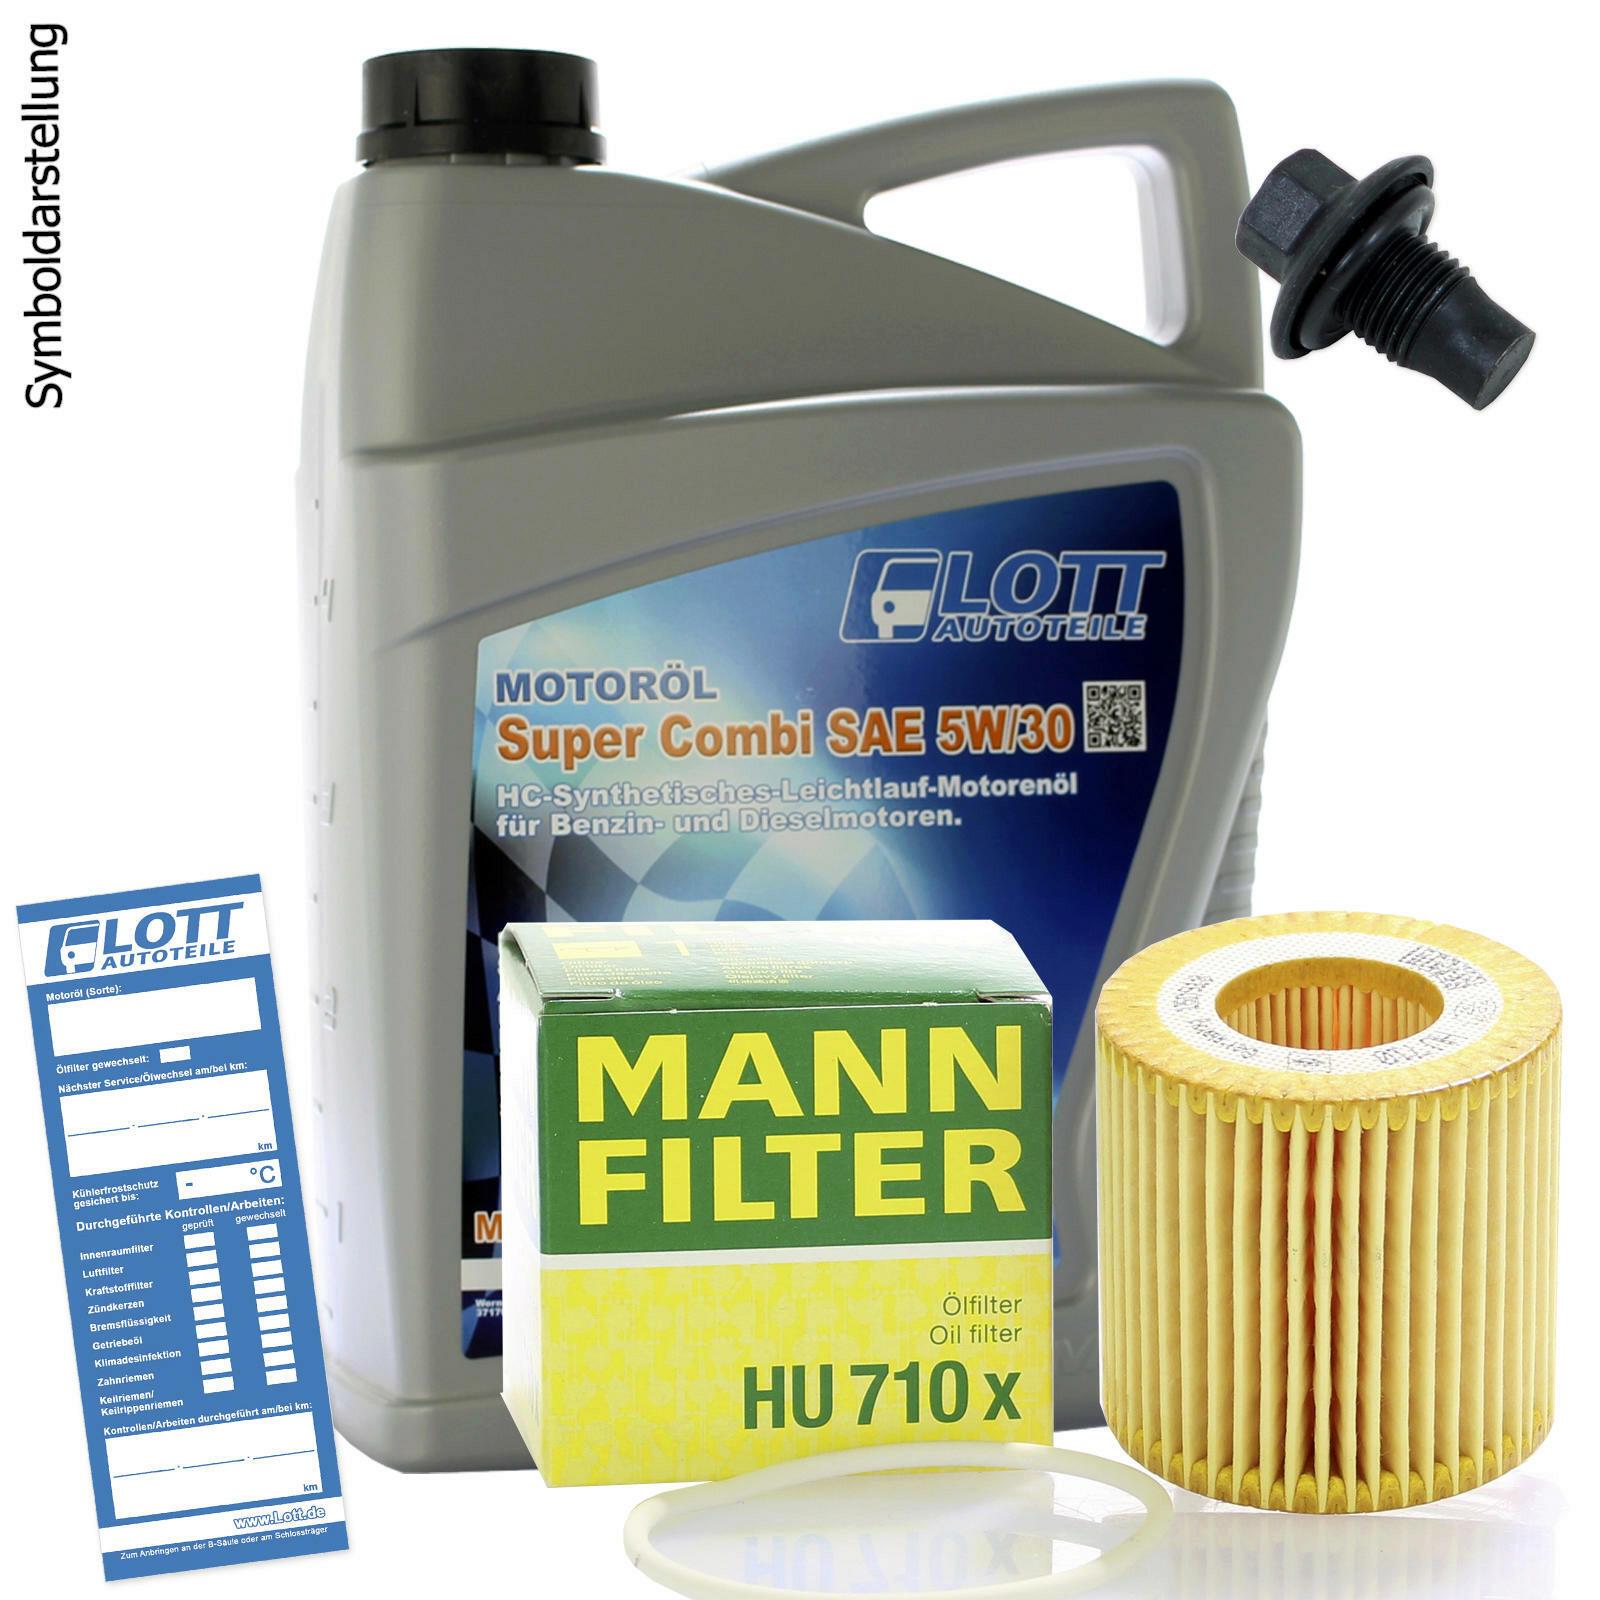 Ölwechsel Set Mann Ölfilter + Lott Motoröl + Ablassschraube